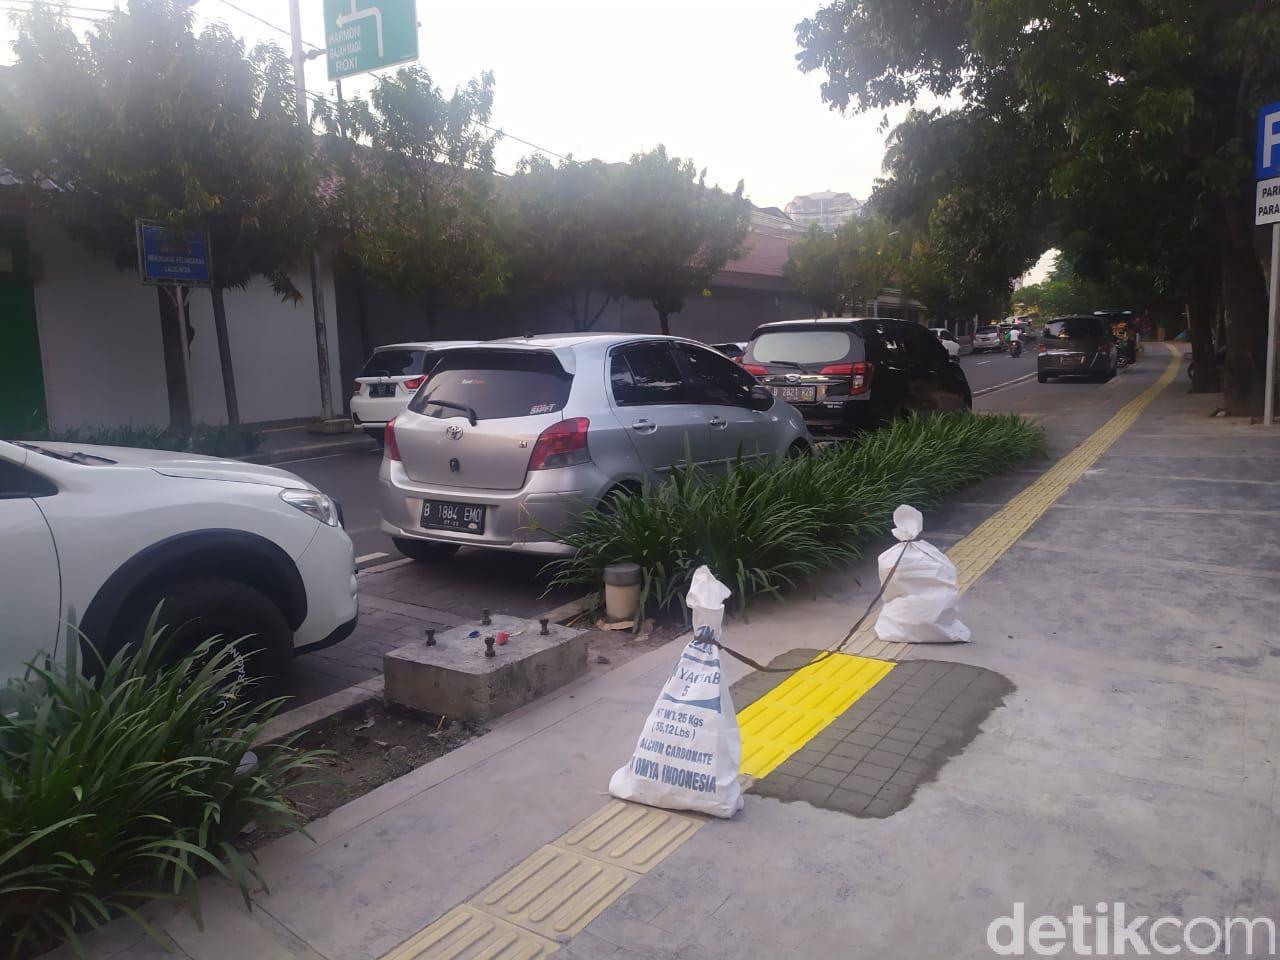 Guiding block yang semula nabrak tiang, kini sudah diperbaiki. Kondisi di Jl Veteran I, Jakpus, 12 Maret 2021. (Luqman Nurhadi Arunanta/detikcom)